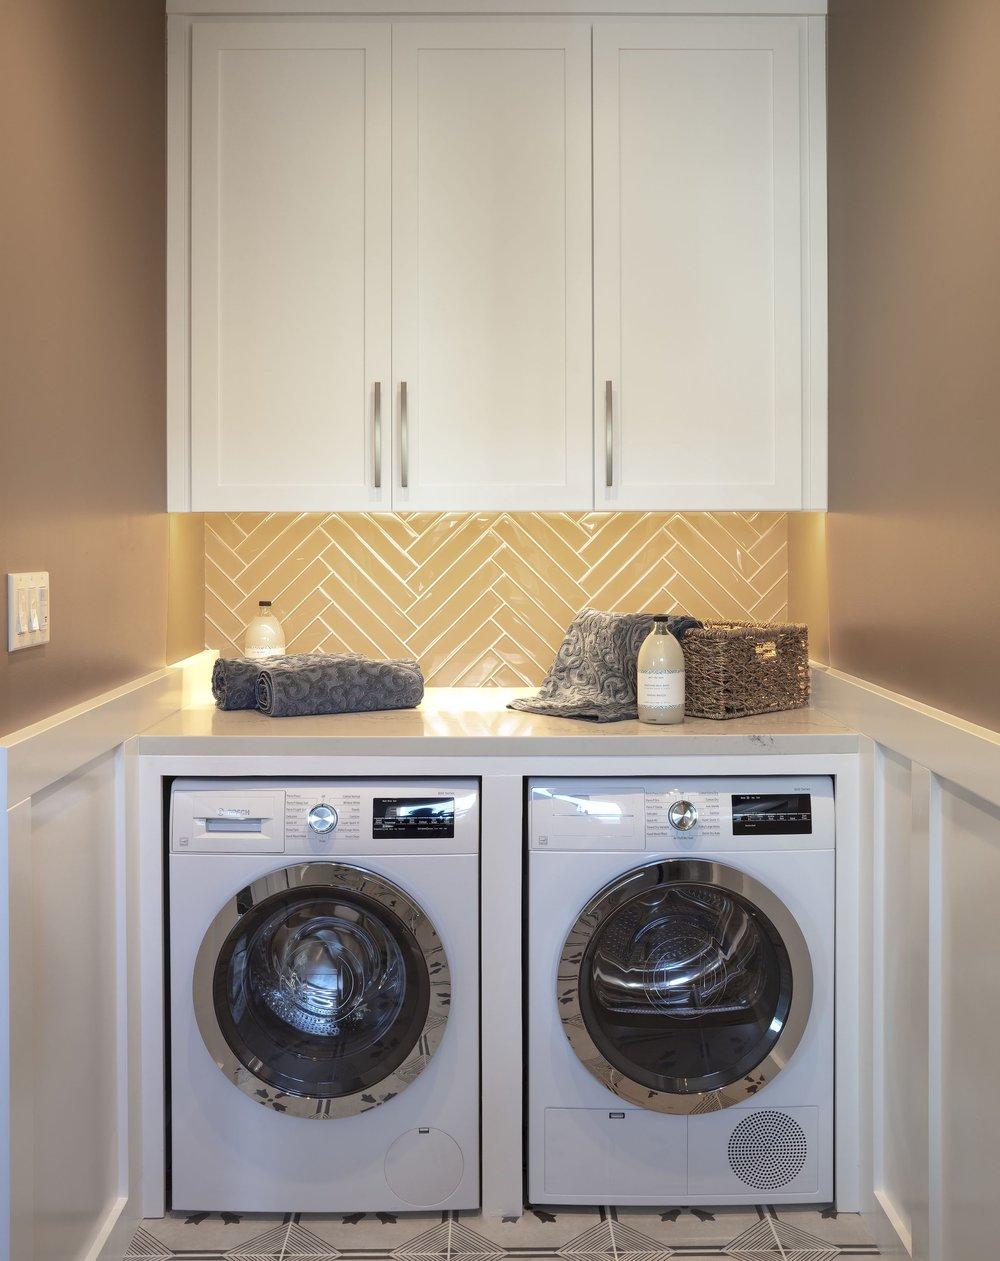 10_Laundry_Room.jpg